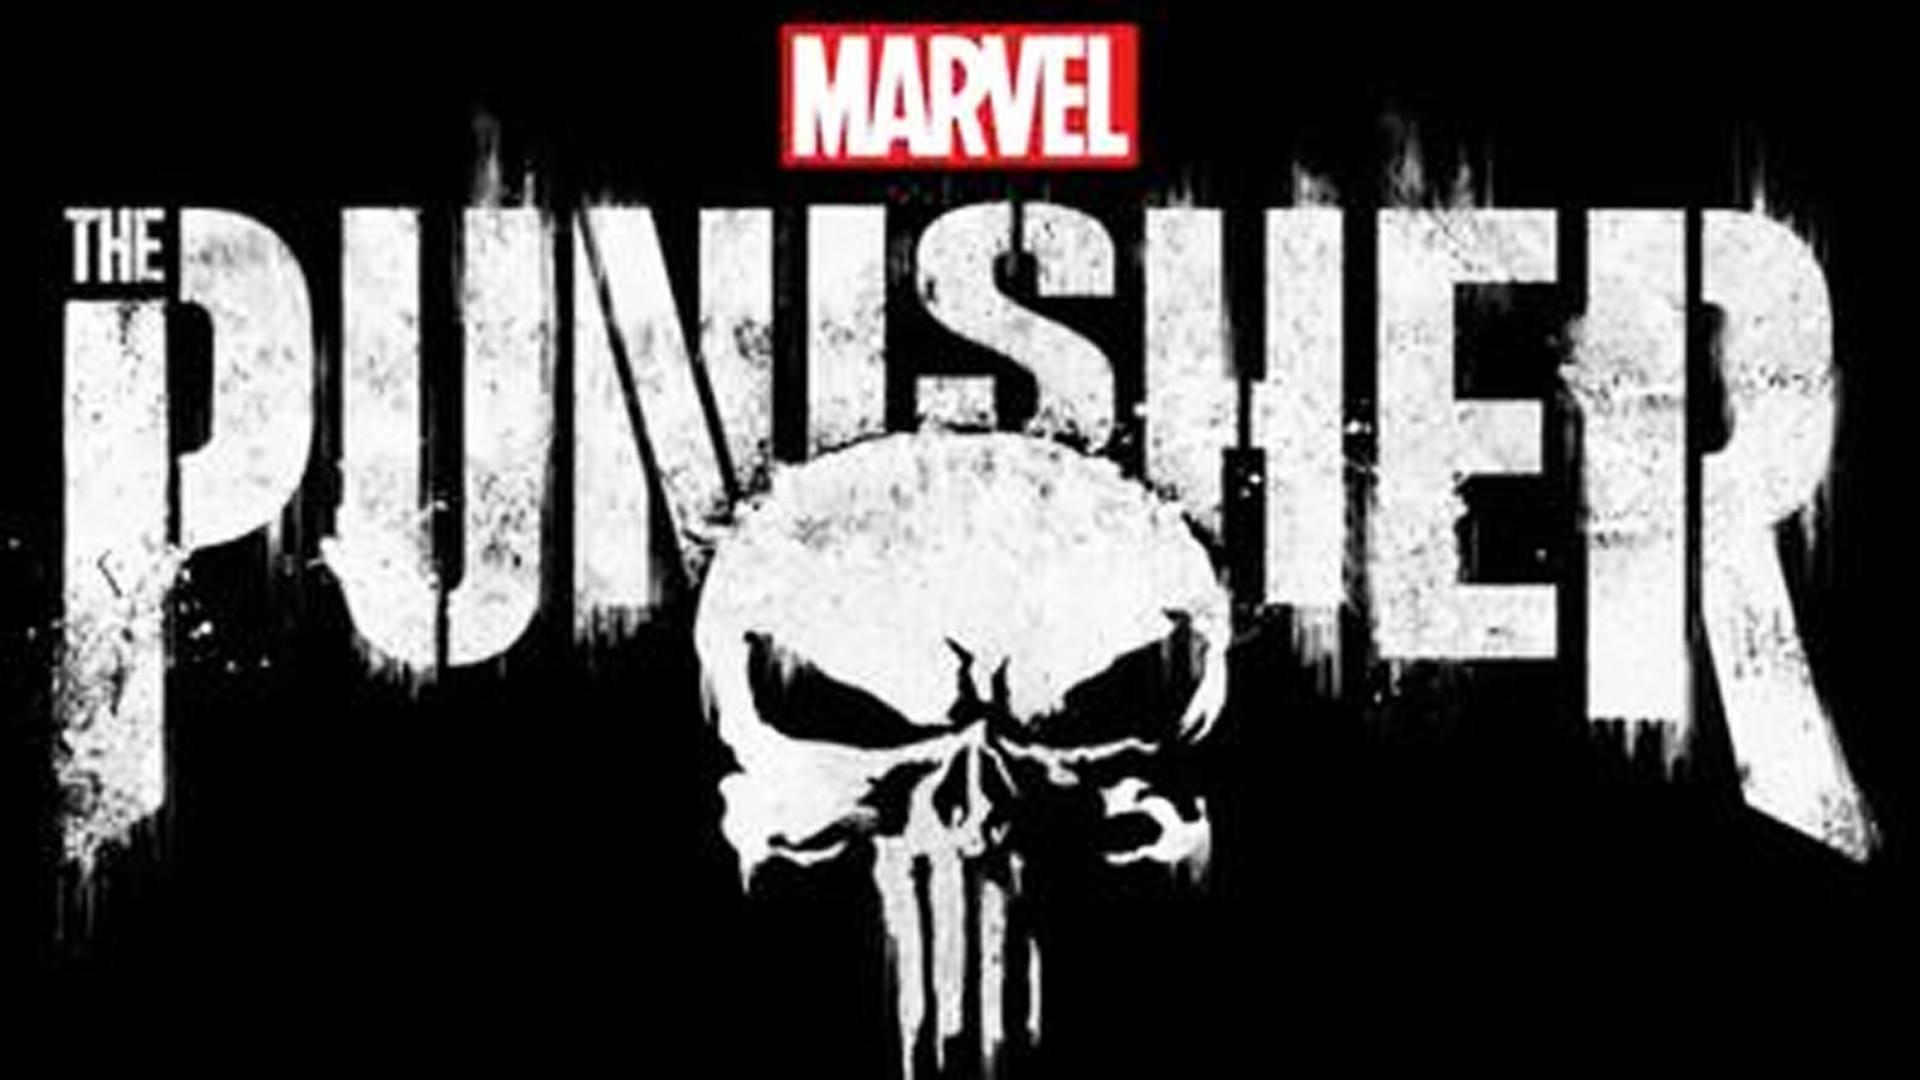 Wonderful Wallpaper Marvel Punisher - 1009436-download-the-punisher-wallpapers-1920x1080  Photograph_982031.jpg